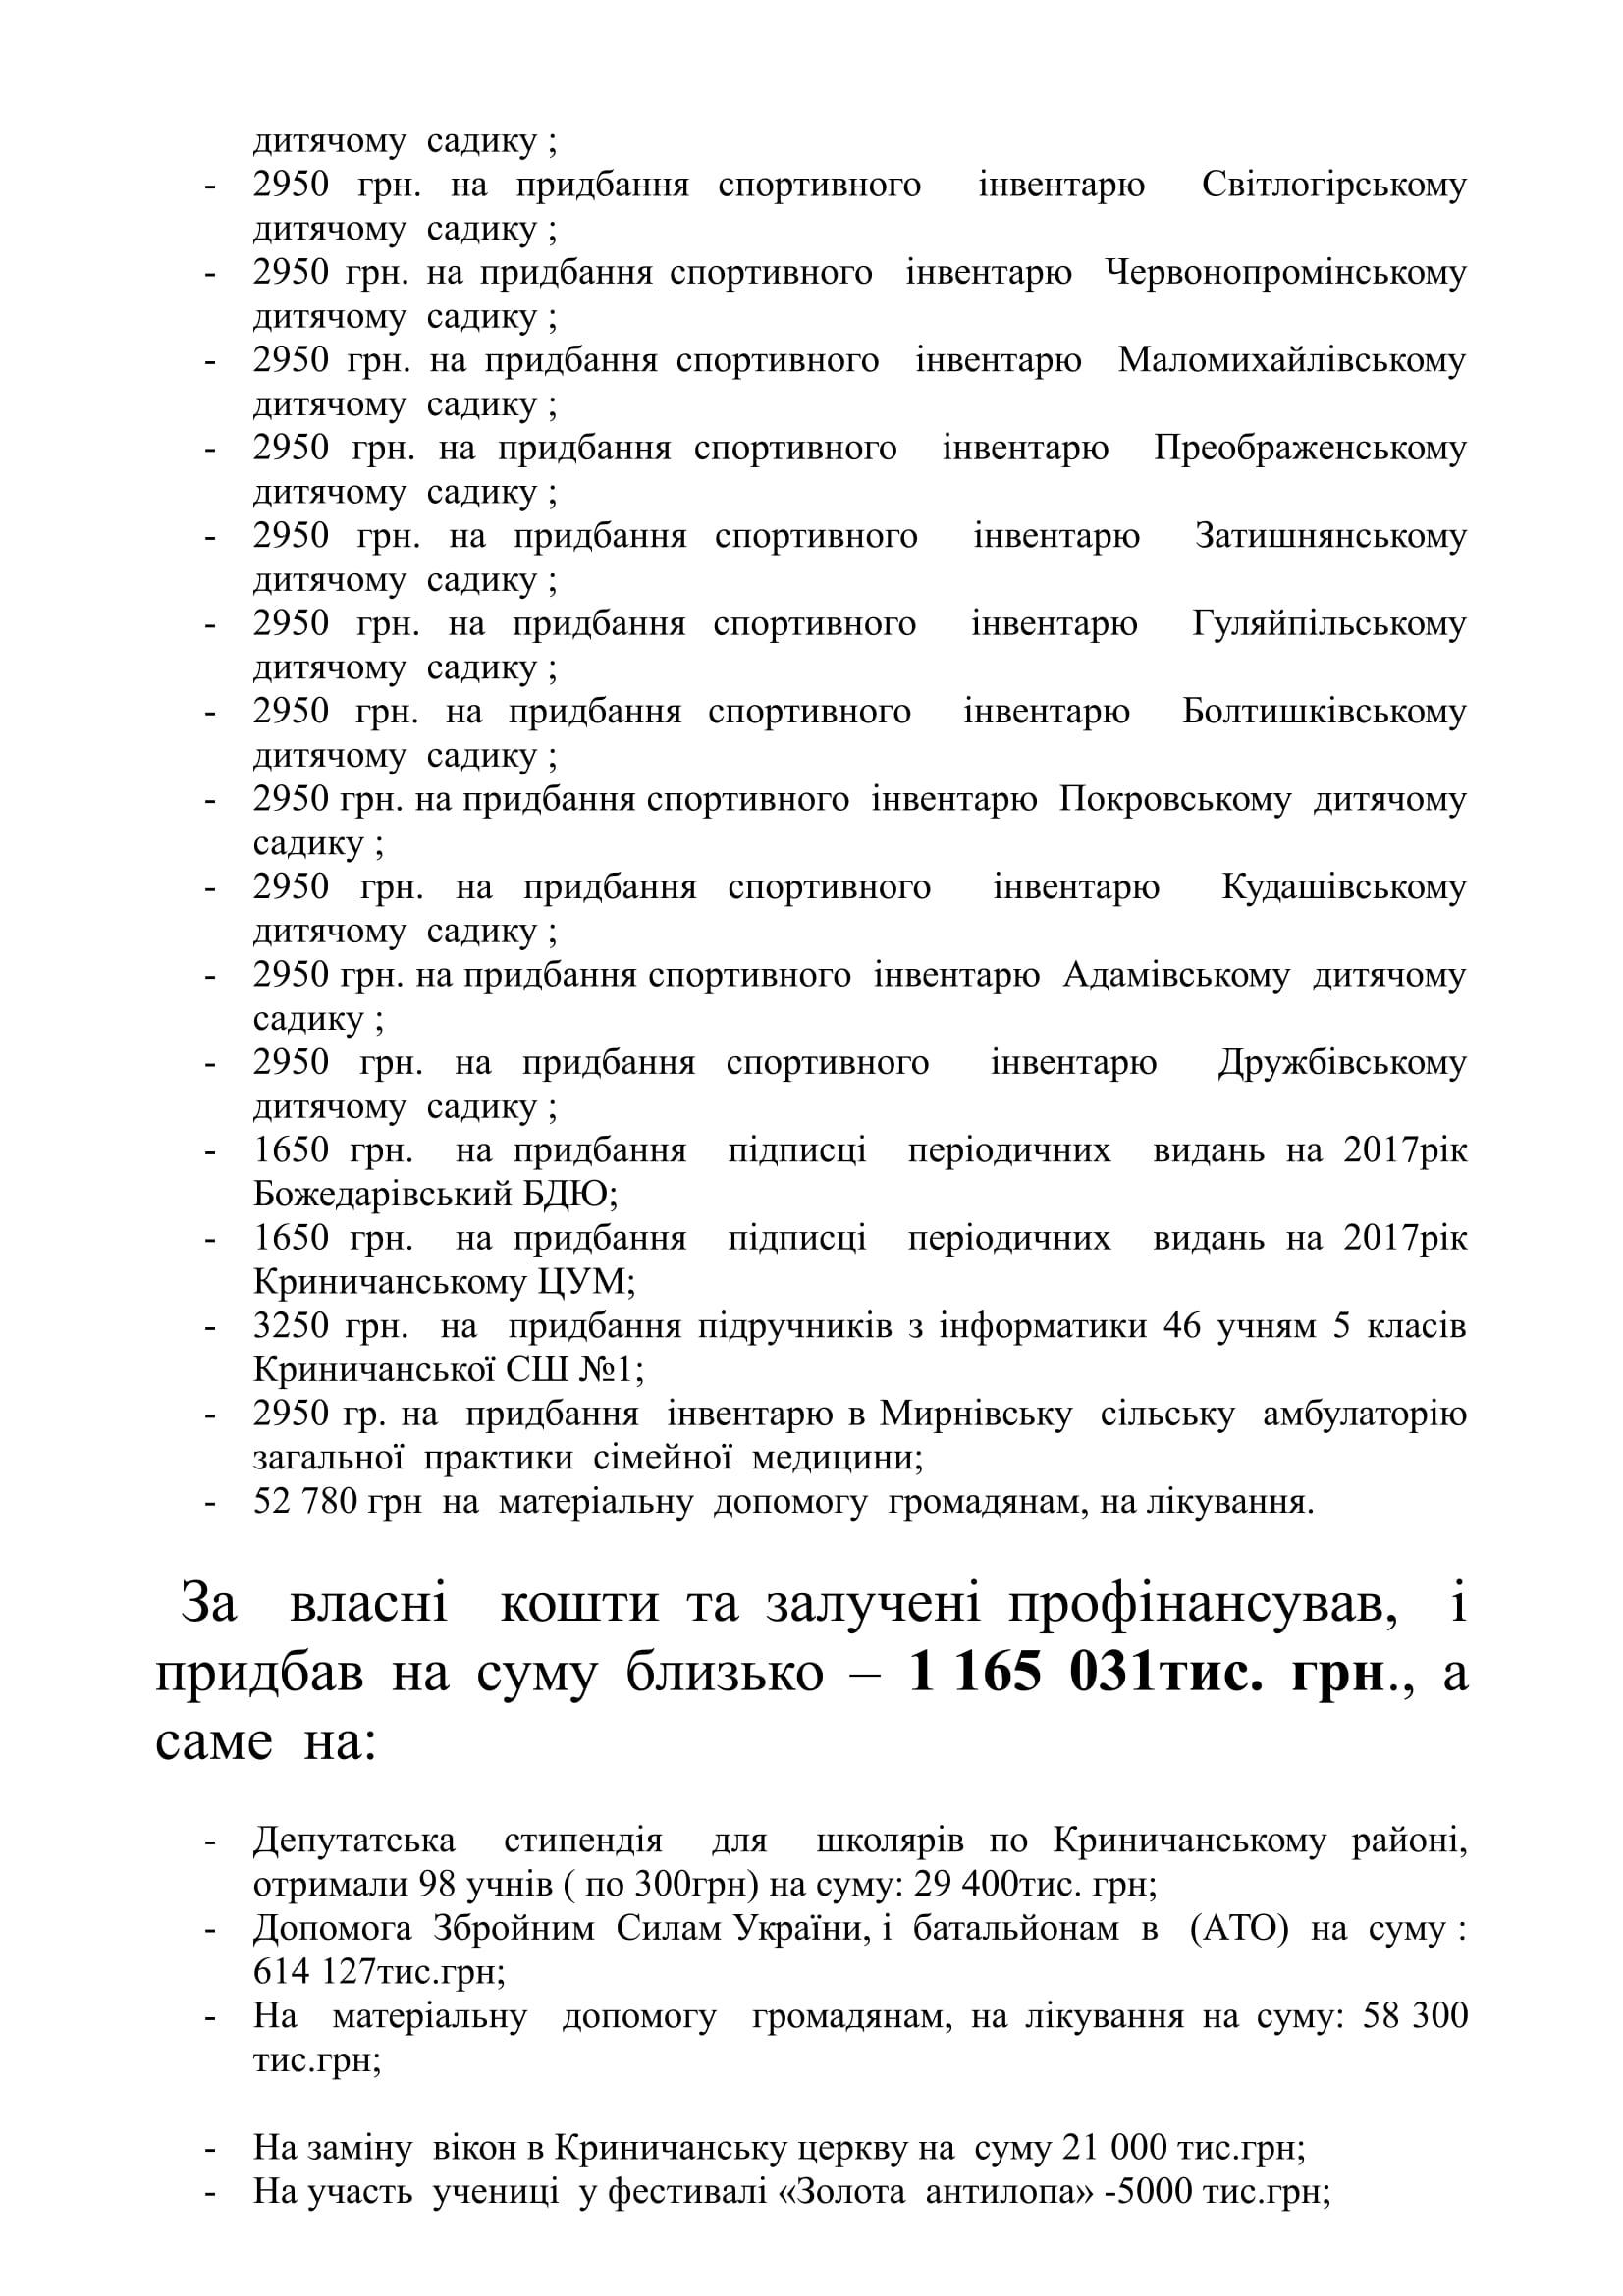 Звіт депутата за 2016 рік-3